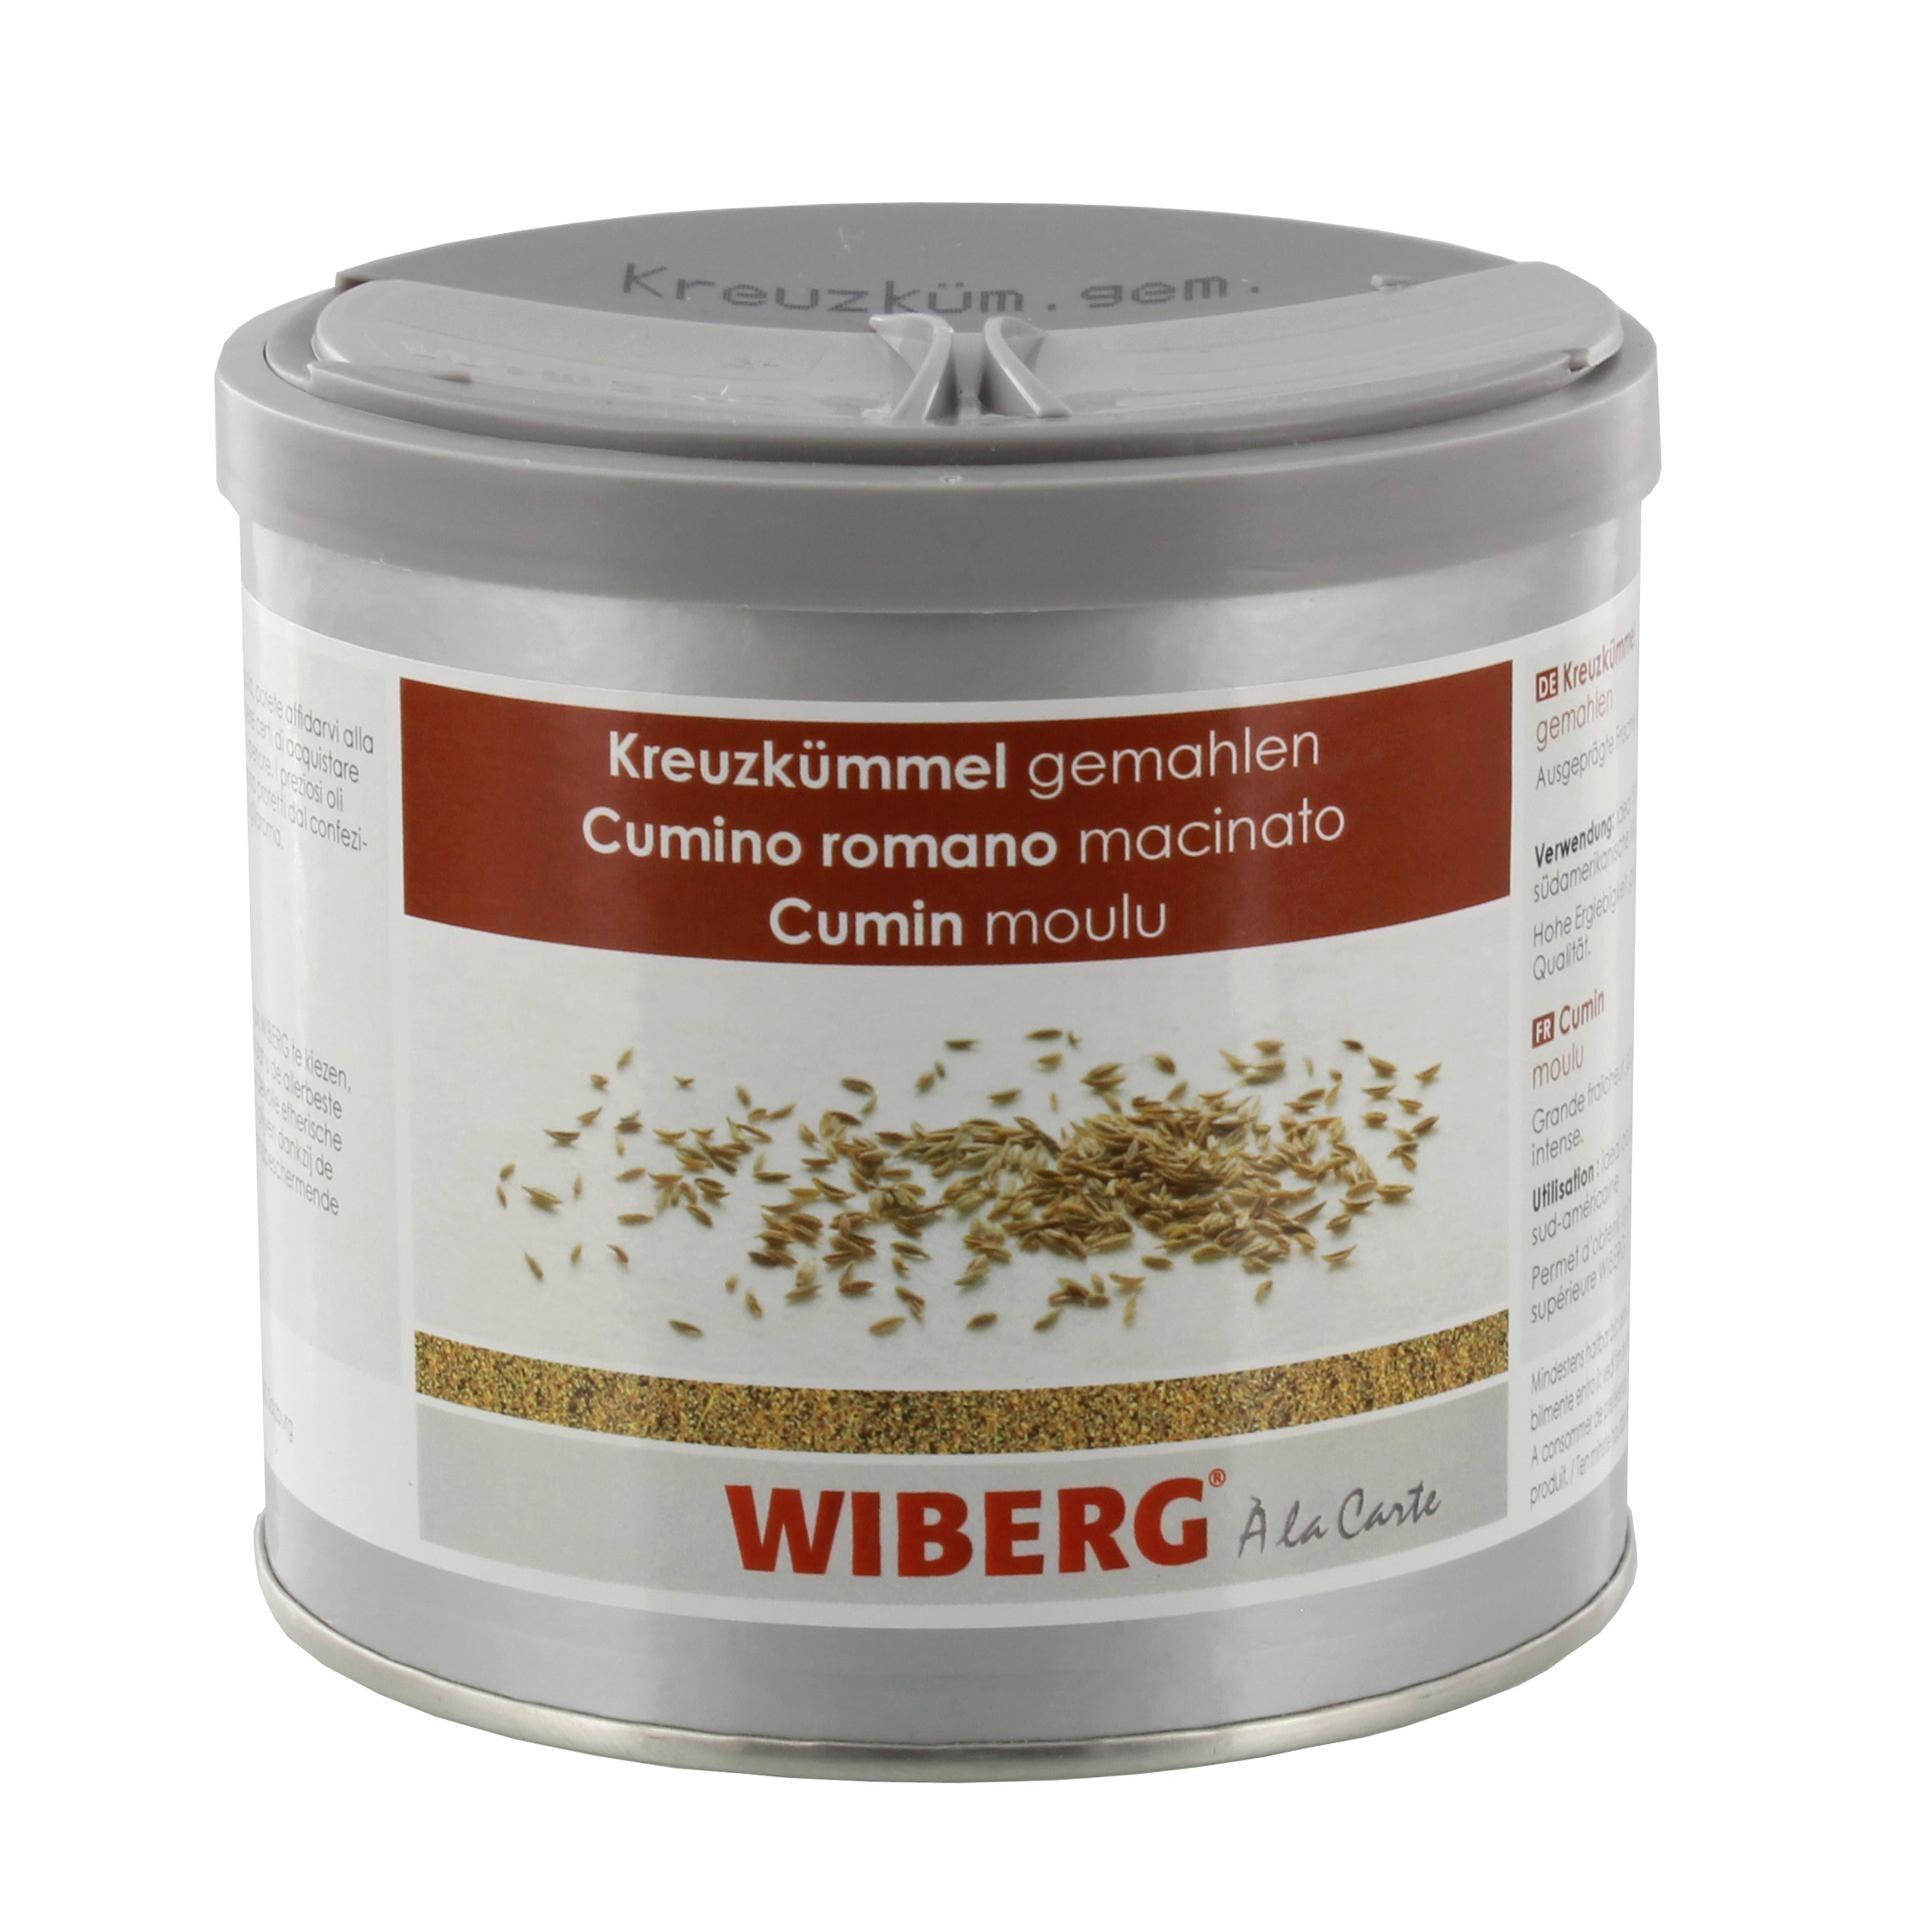 Wiberg - Kreuzkümmel gemahlen - 250g